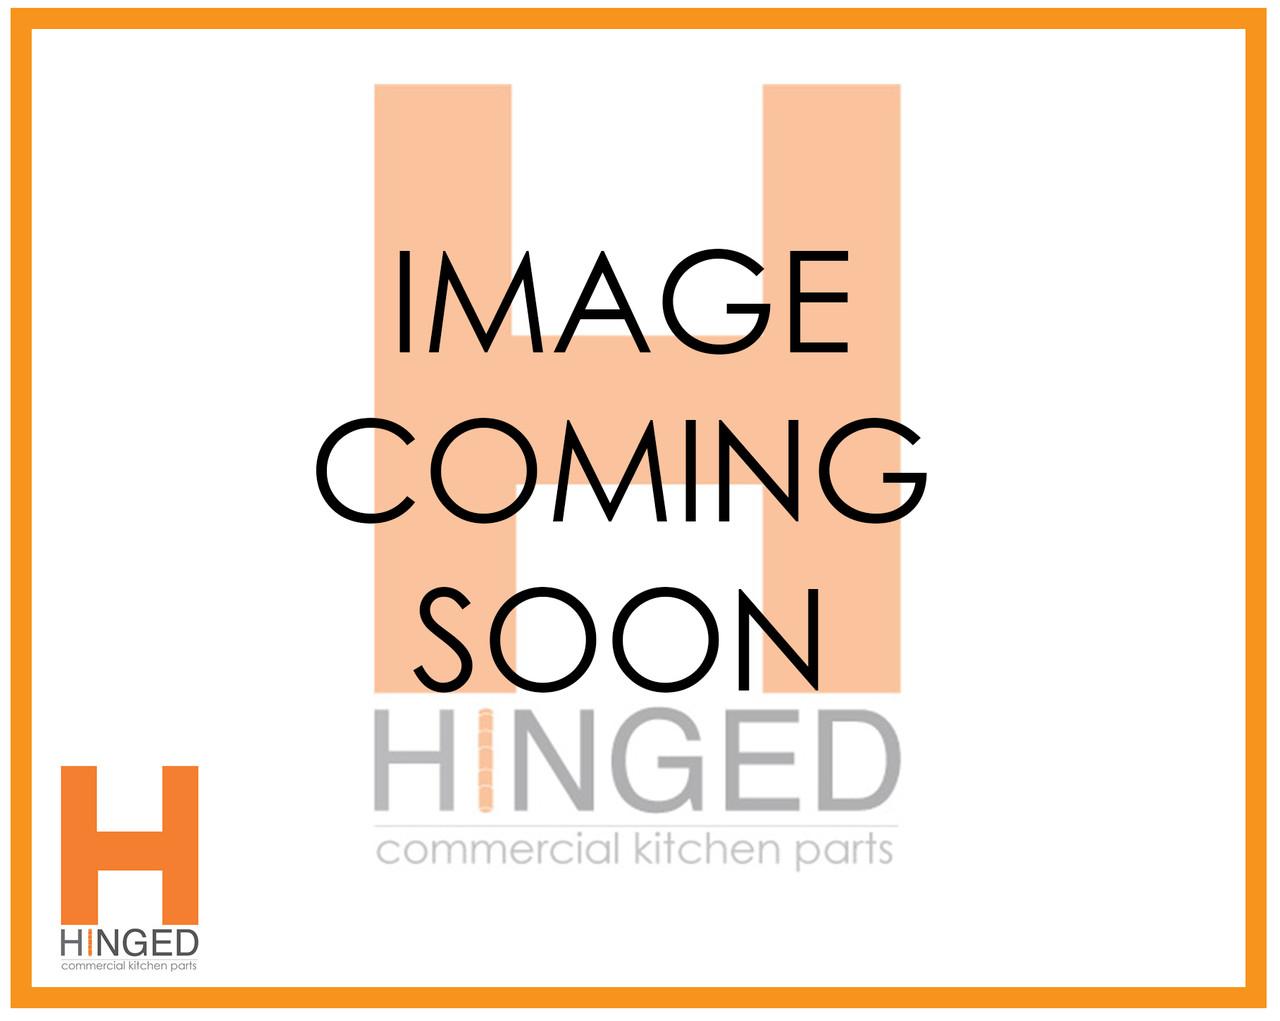 Norlake 000822 Cooler/Freezer Door Gasket 31-1/4 x 80, 3-Sided